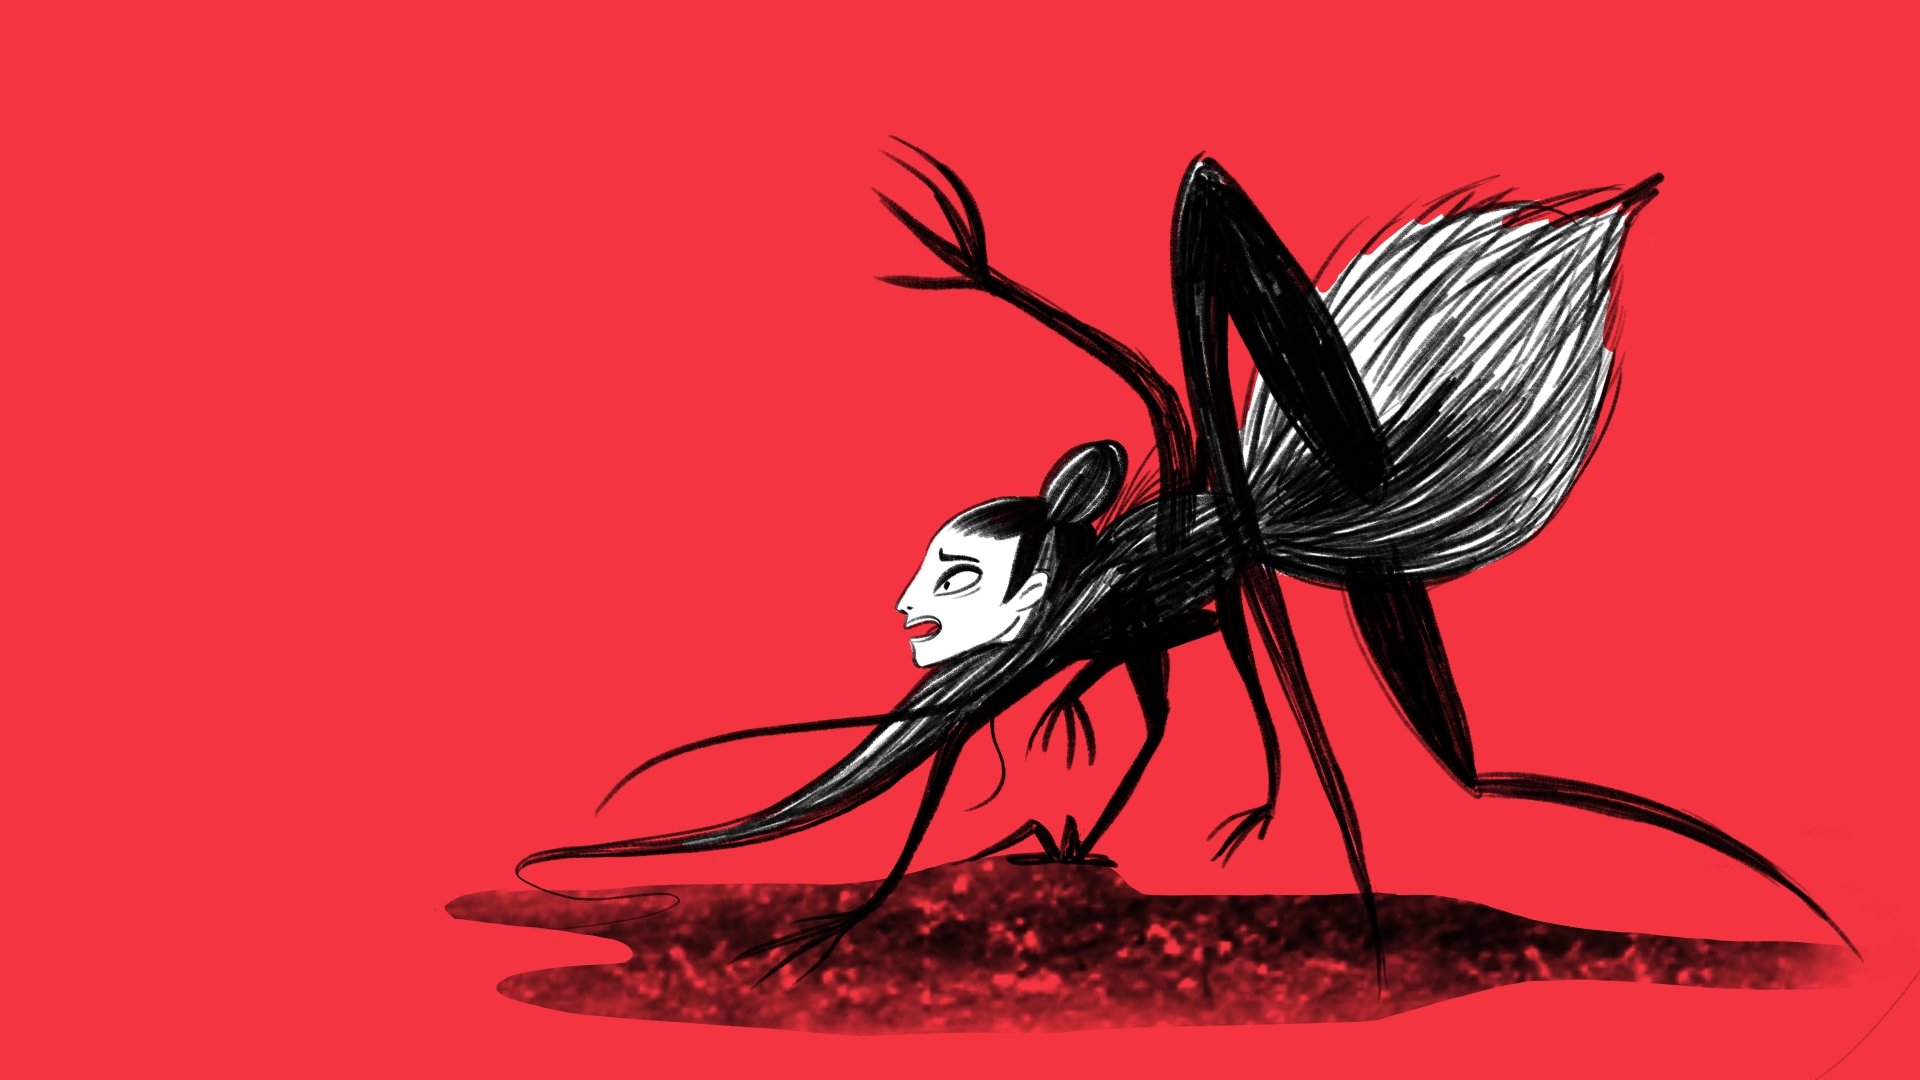 Arachne_design_v12.jpg